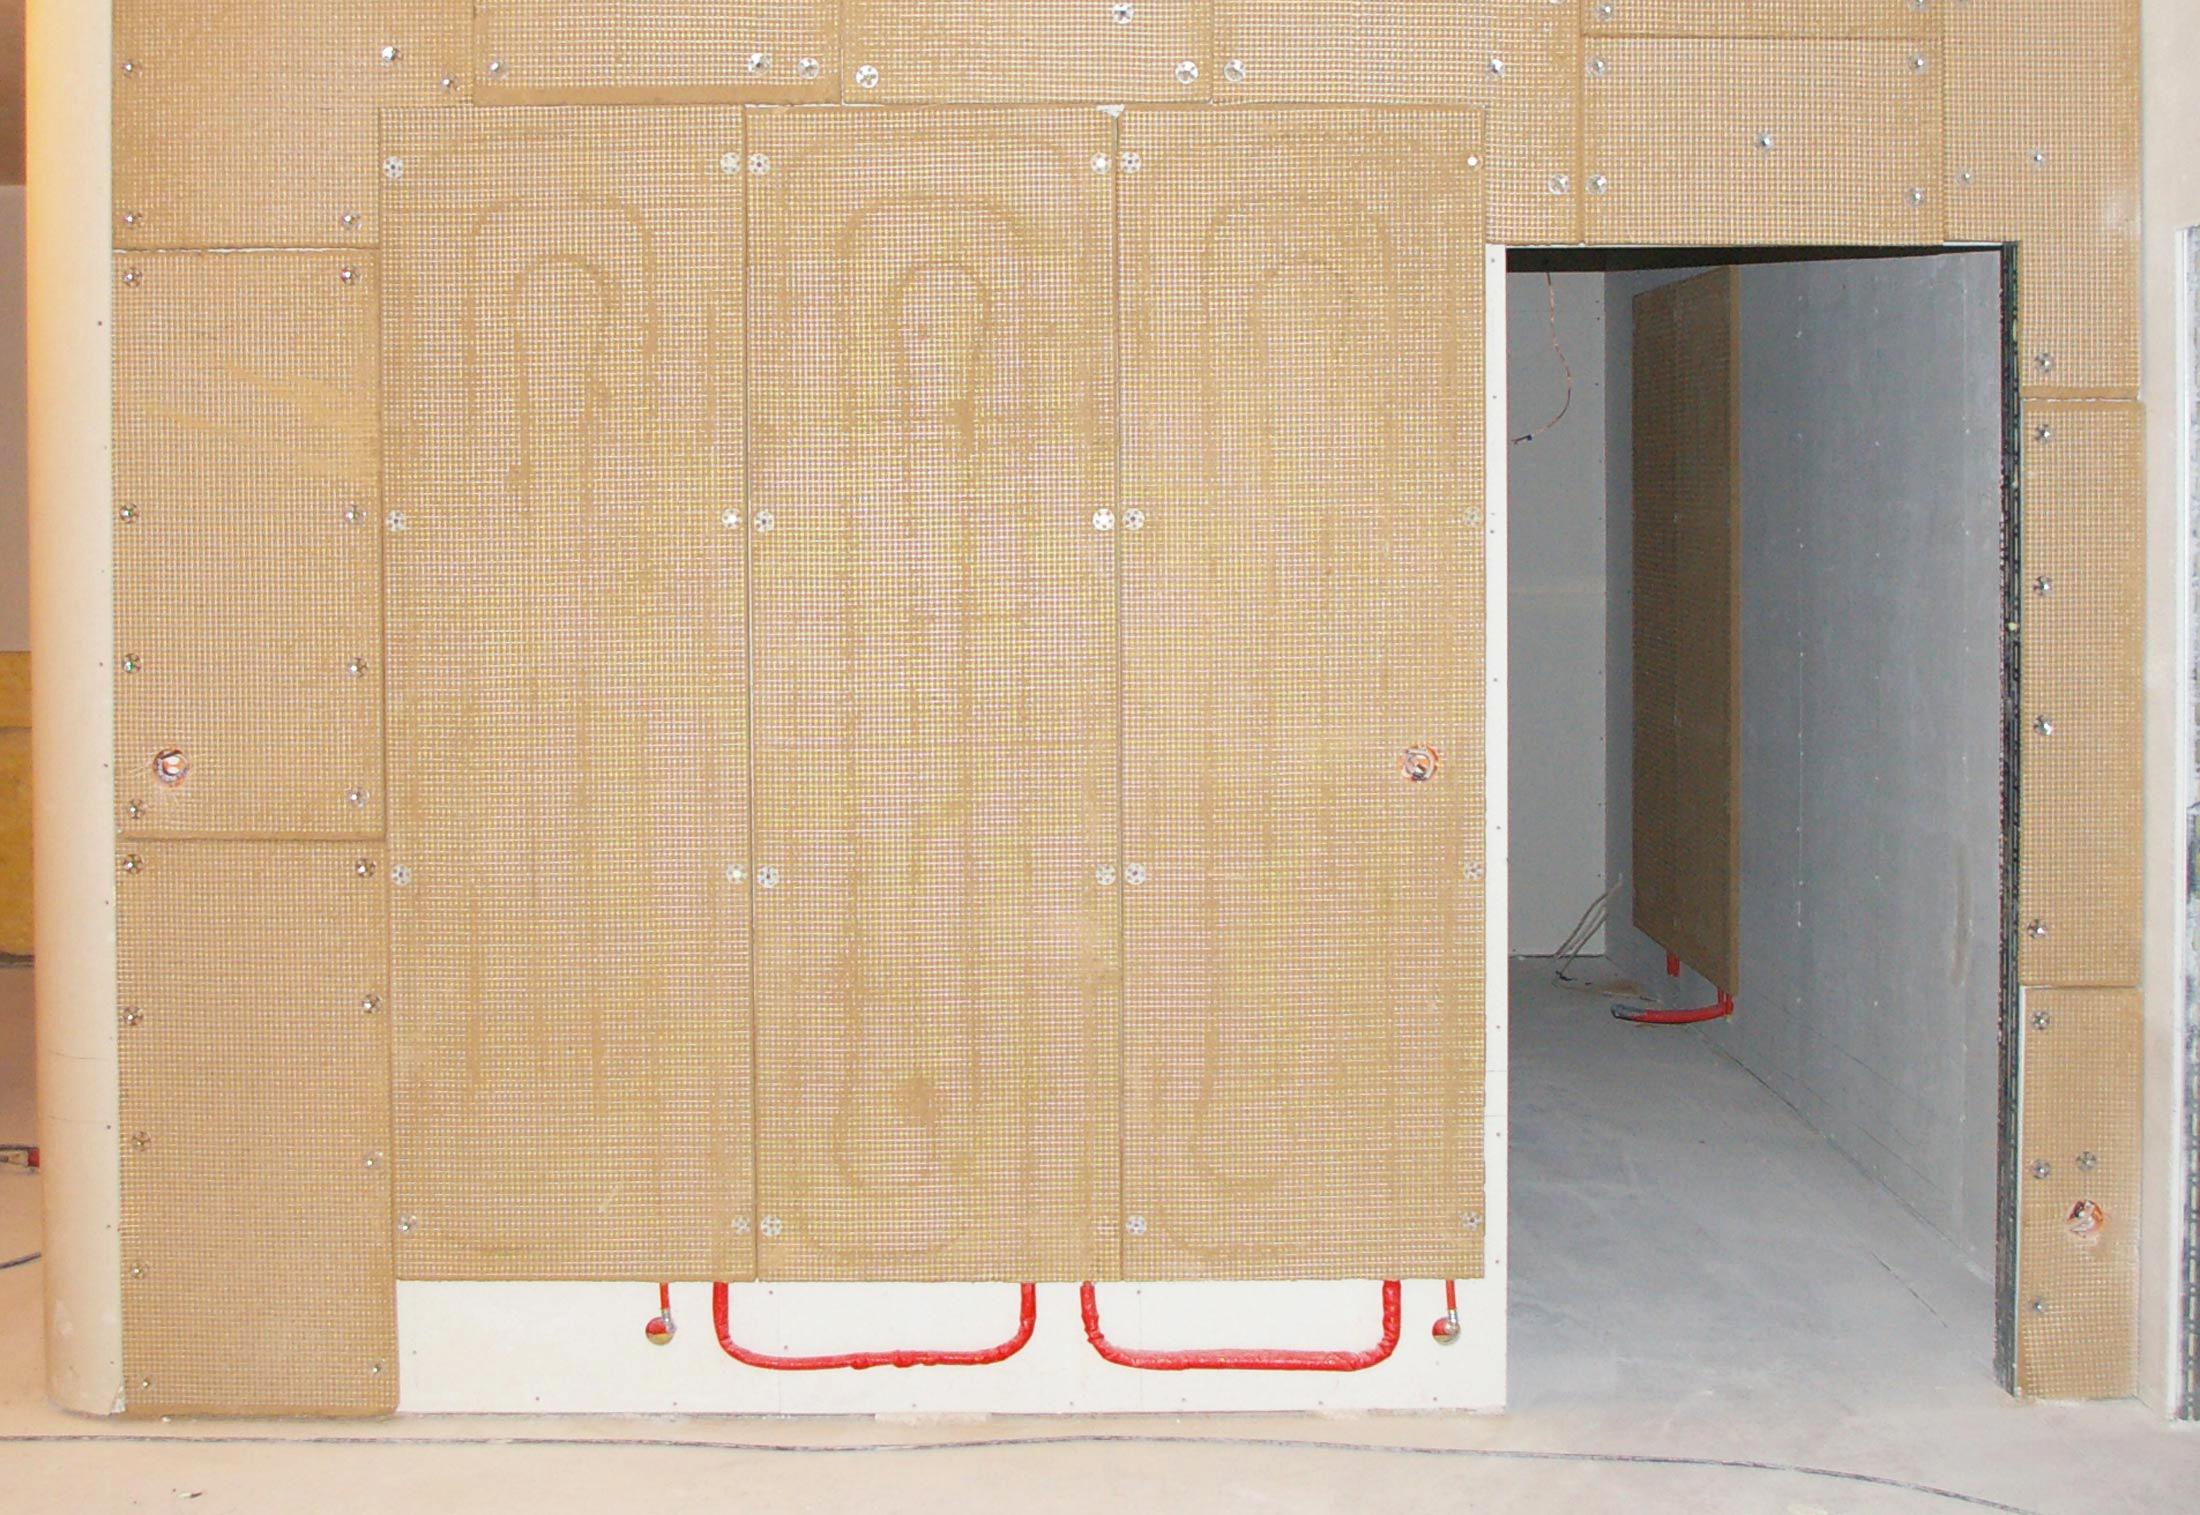 heating element by wem wandheizung stylepark. Black Bedroom Furniture Sets. Home Design Ideas